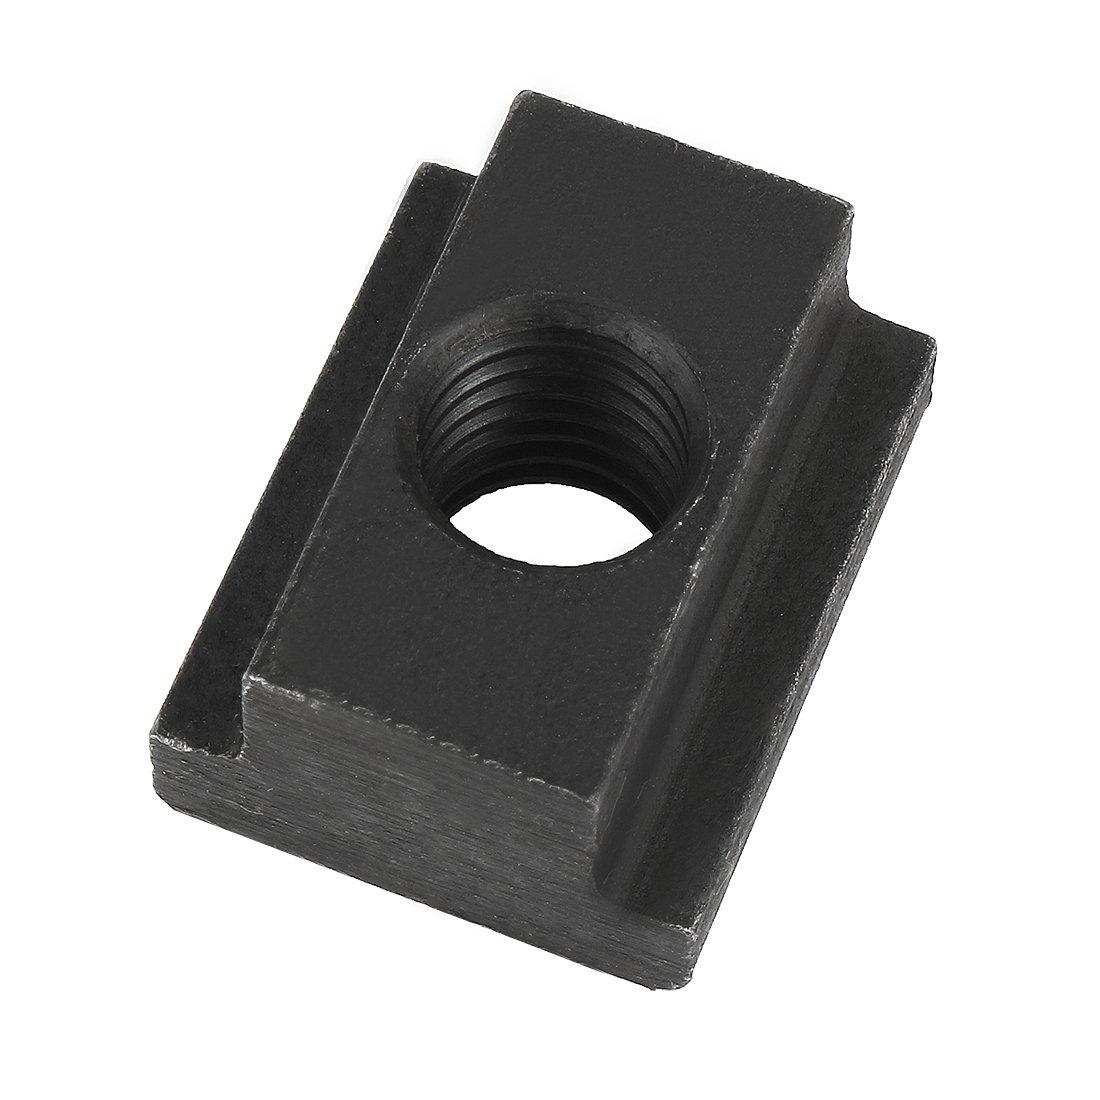 1018 Steel T-Slot Nut 3//8-16 Threads 5//8 Height 9//16 Slot Depth Te-Co 41406 Pack of 5 Made in US 9//16 Slot Depth 3//8-16 Threads 5//8 Height Black Oxide Finish